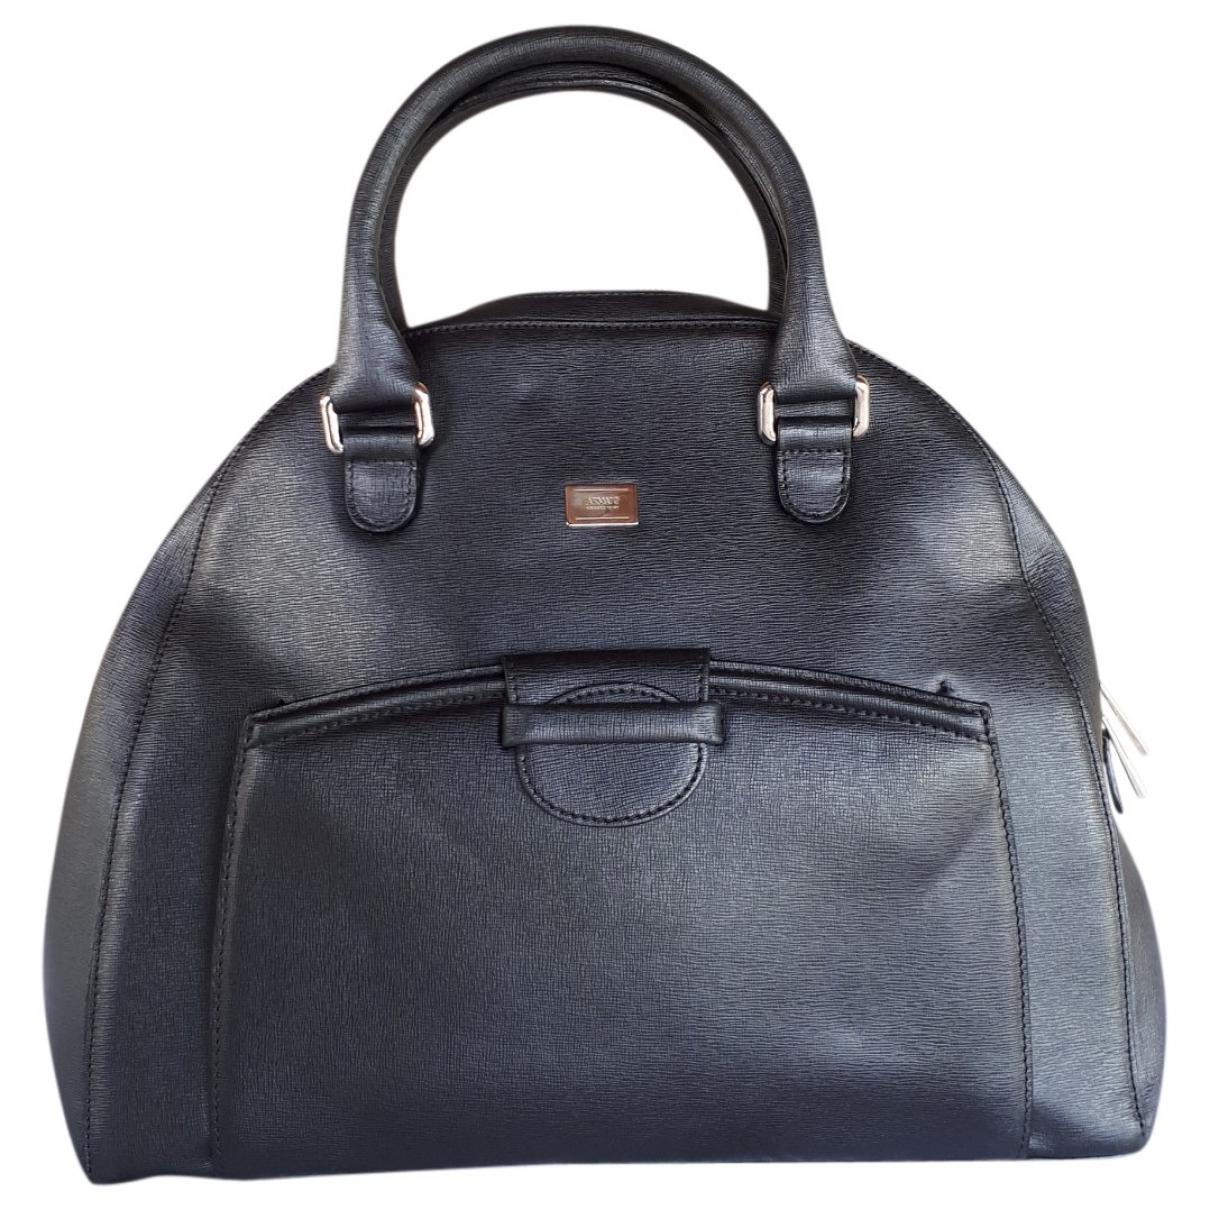 Armani Collezioni \N Black Leather handbag for Women \N